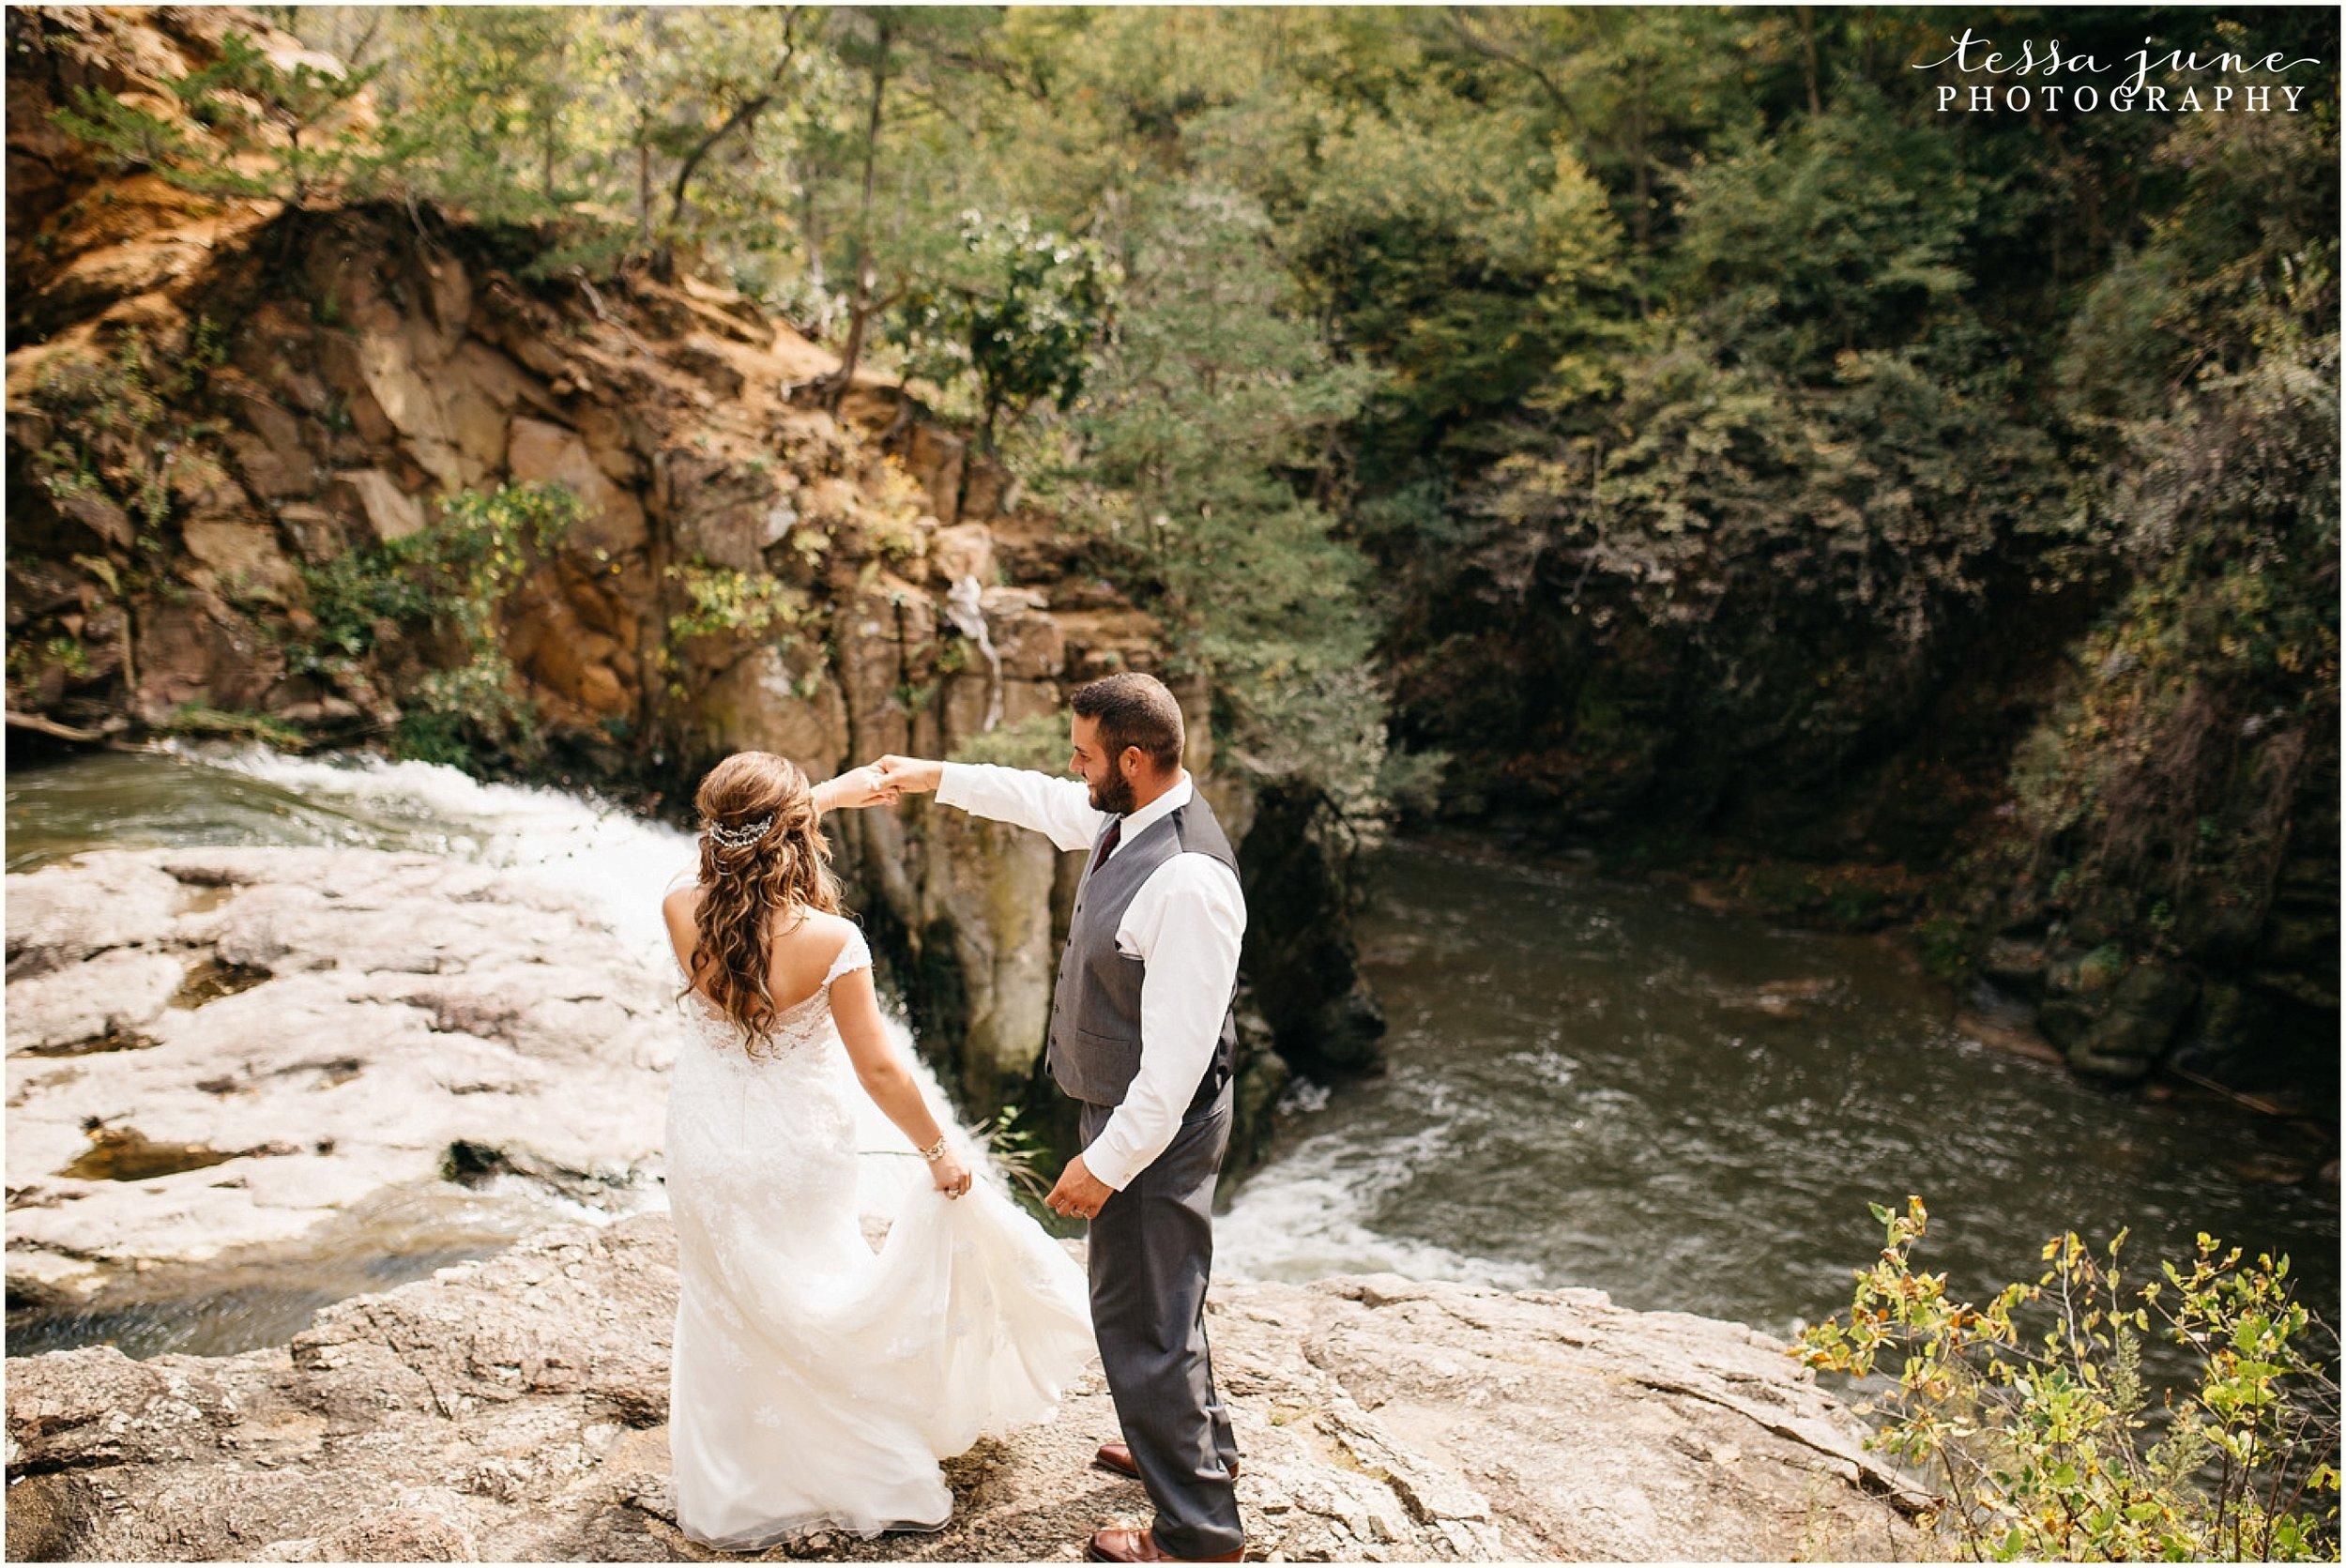 bohemian-minnesota-wedding-mismatched-bridesmaid-dresses-waterfall-st-cloud-tessa-june-photography-64.jpg